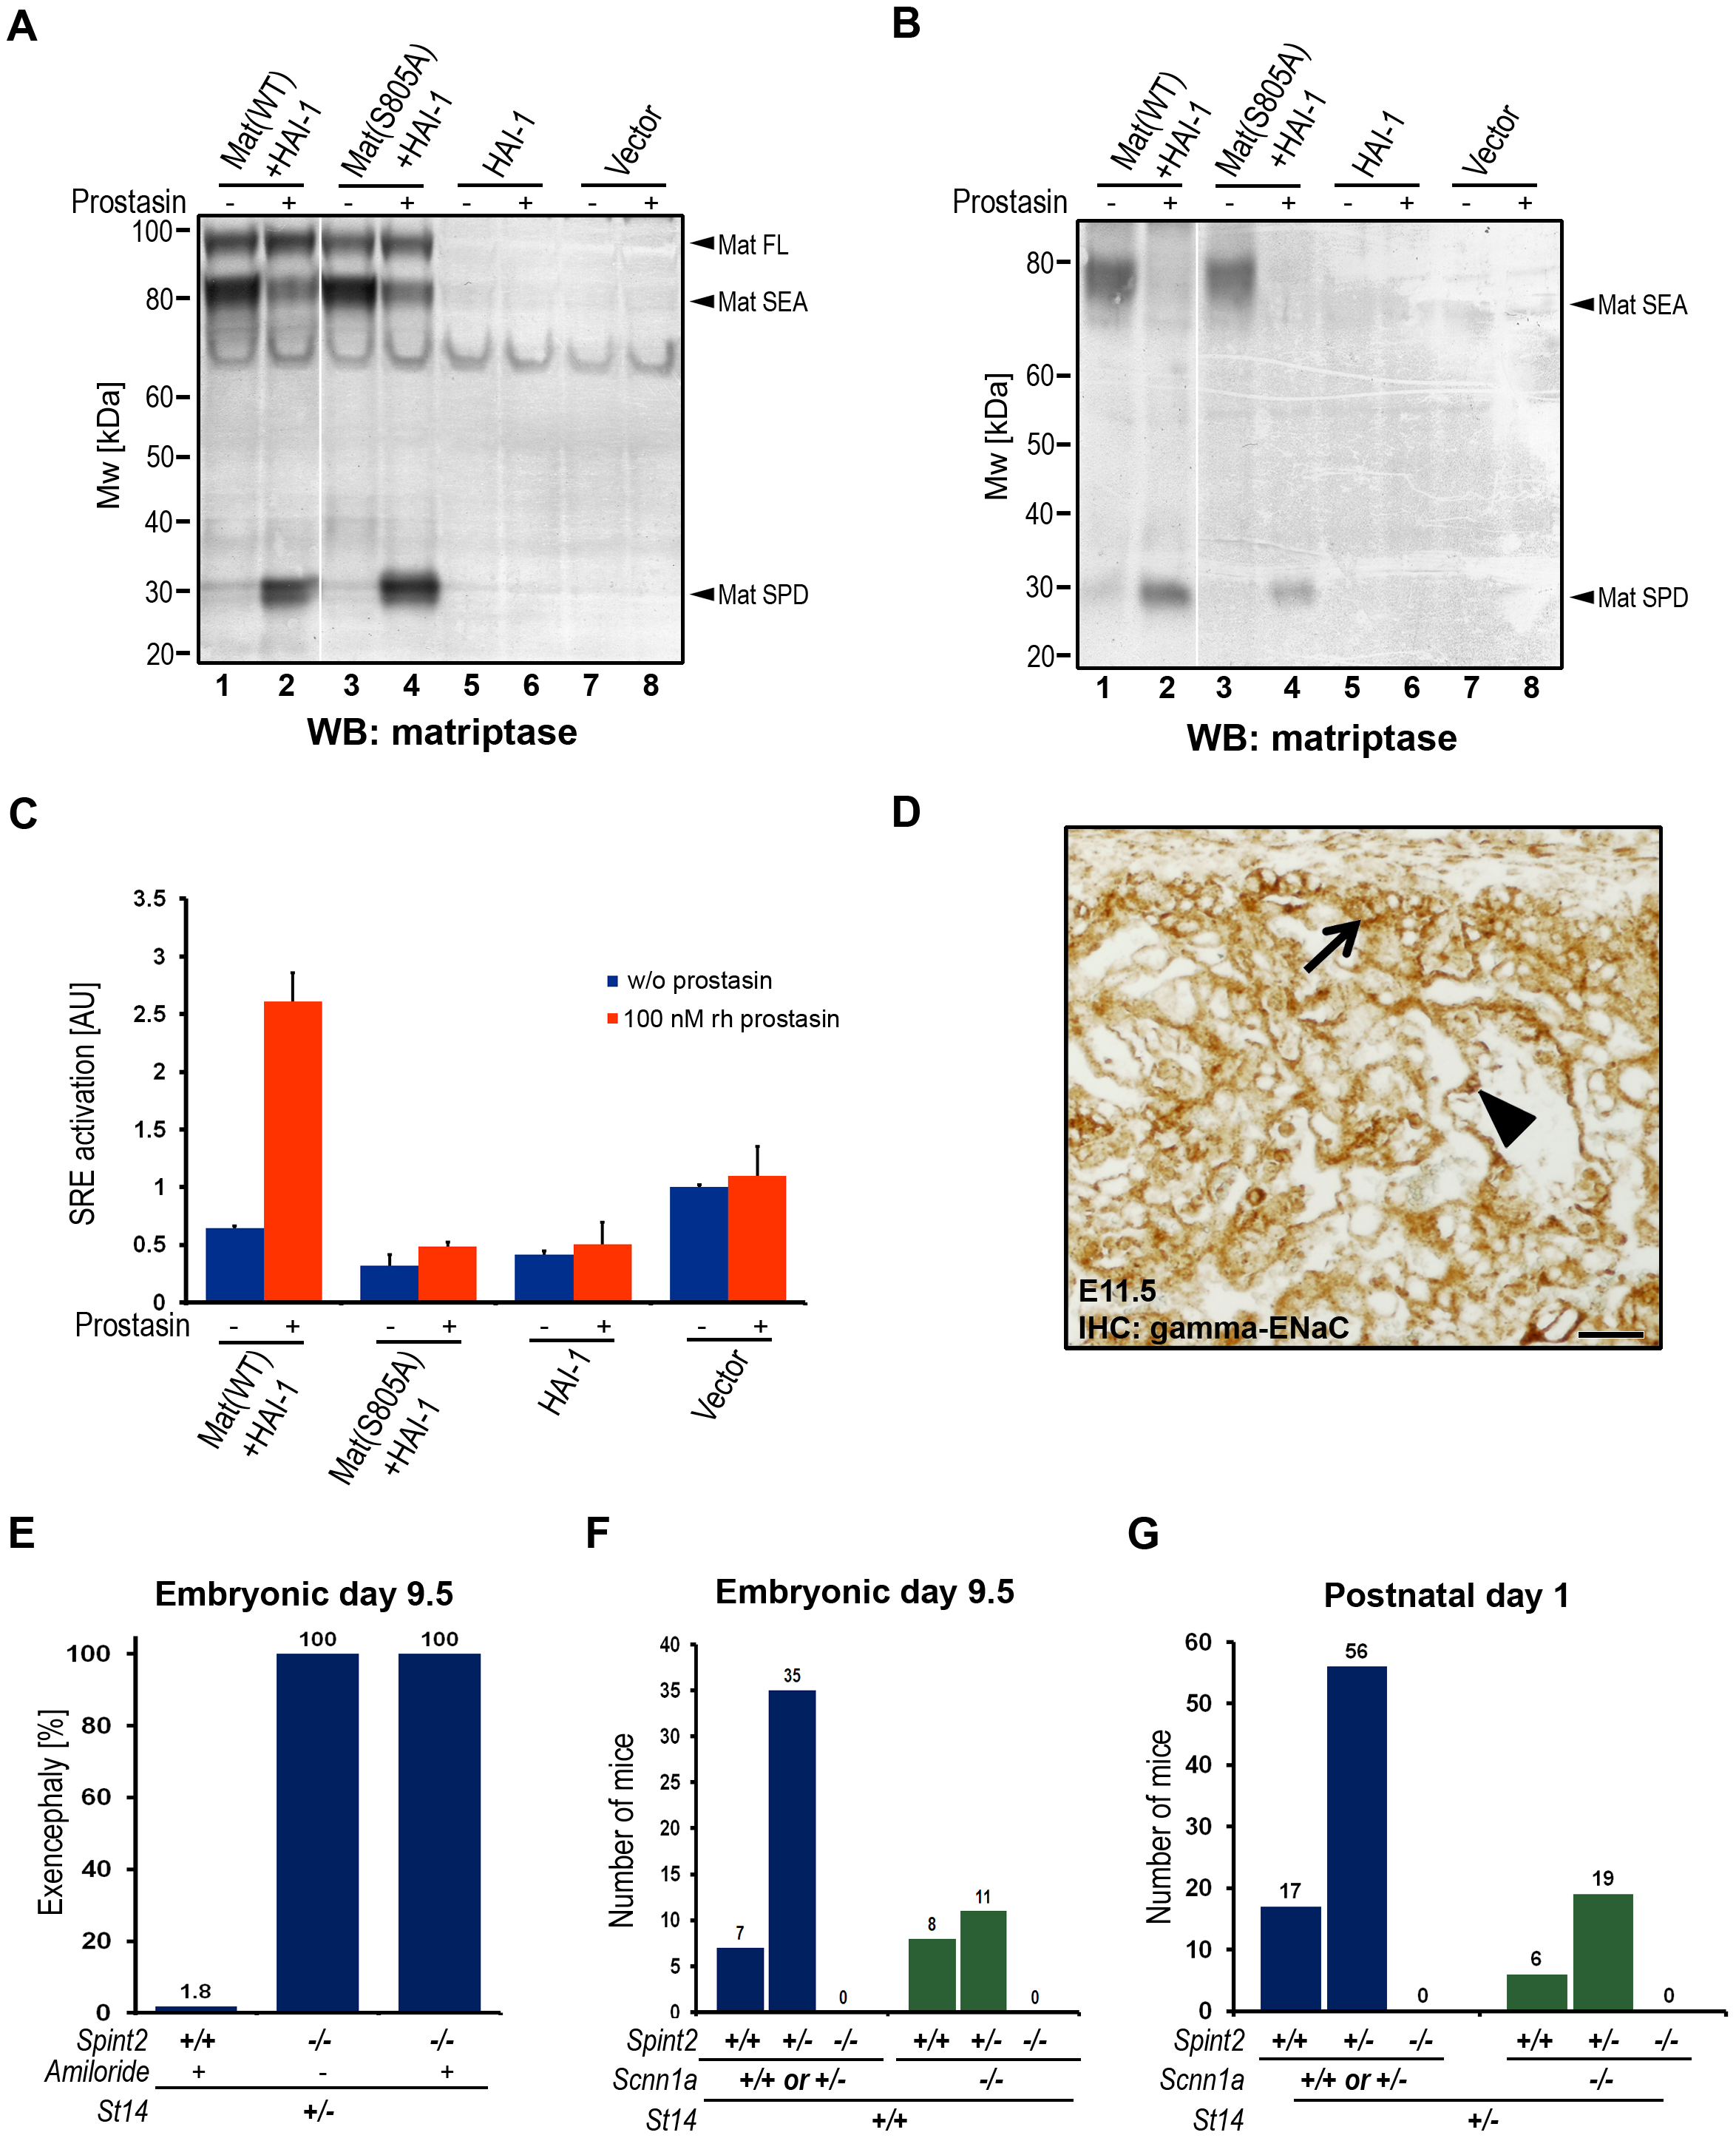 Prostasin activates matriptase on the surface of HEK293 cells.